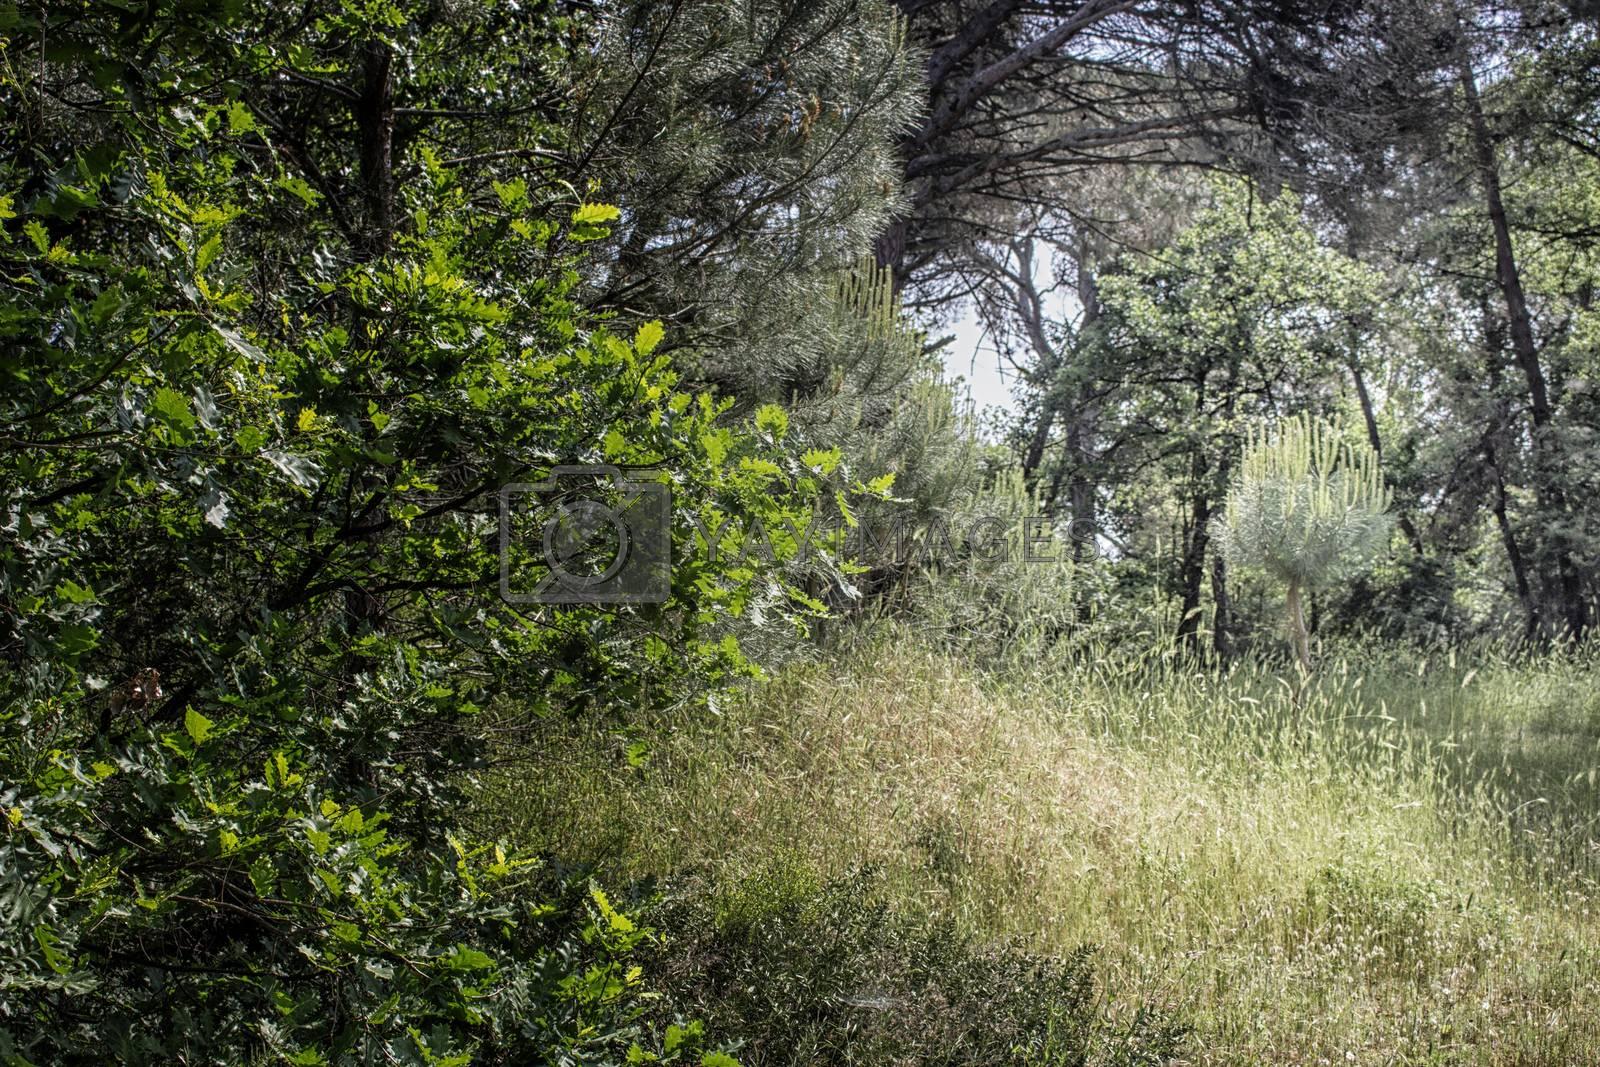 Plants in the pinewood forest along the Pialassa della Baiona brackish lagoon near Marina Romea on the  Adriatic seaside in Ravenna (Italy)